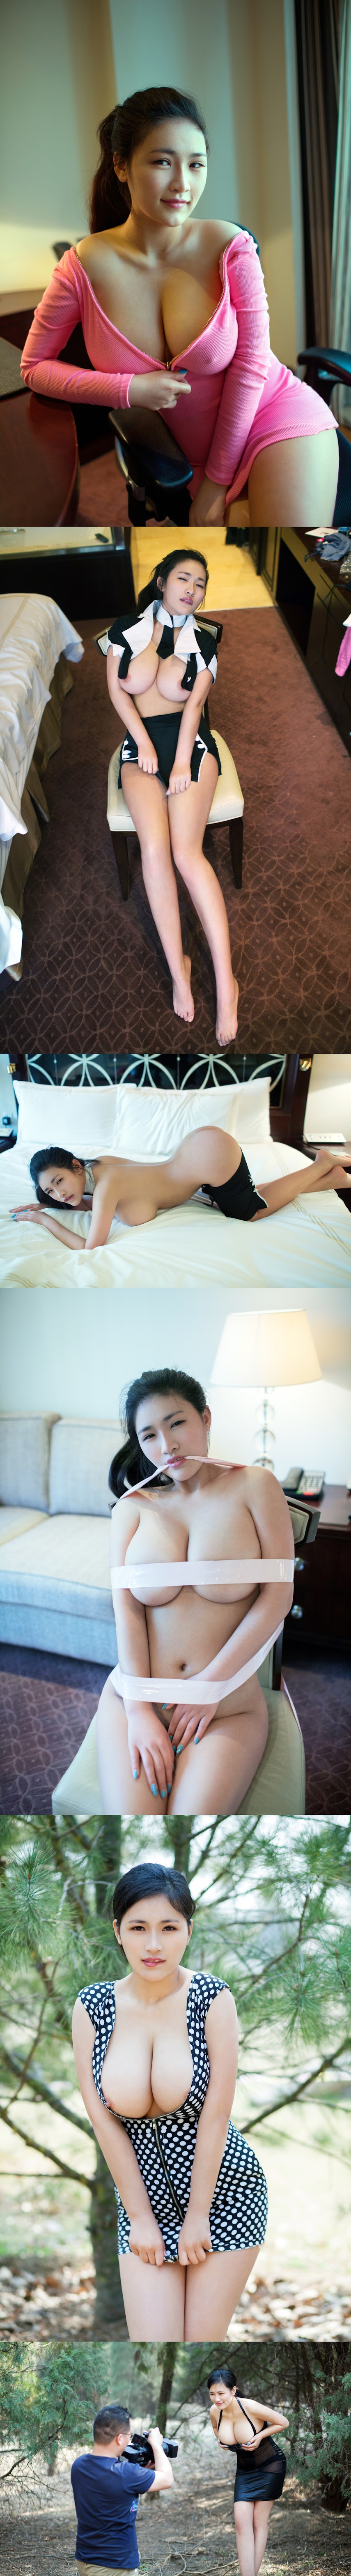 TuiGirl 57 连欣